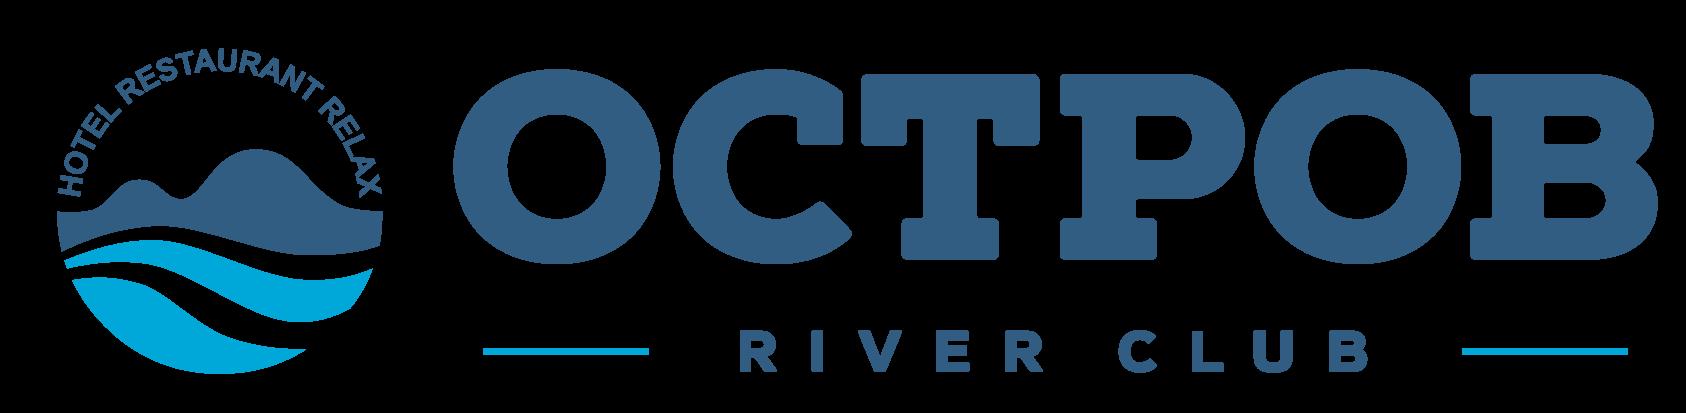 Ostrov River Club - Ostrov River Club